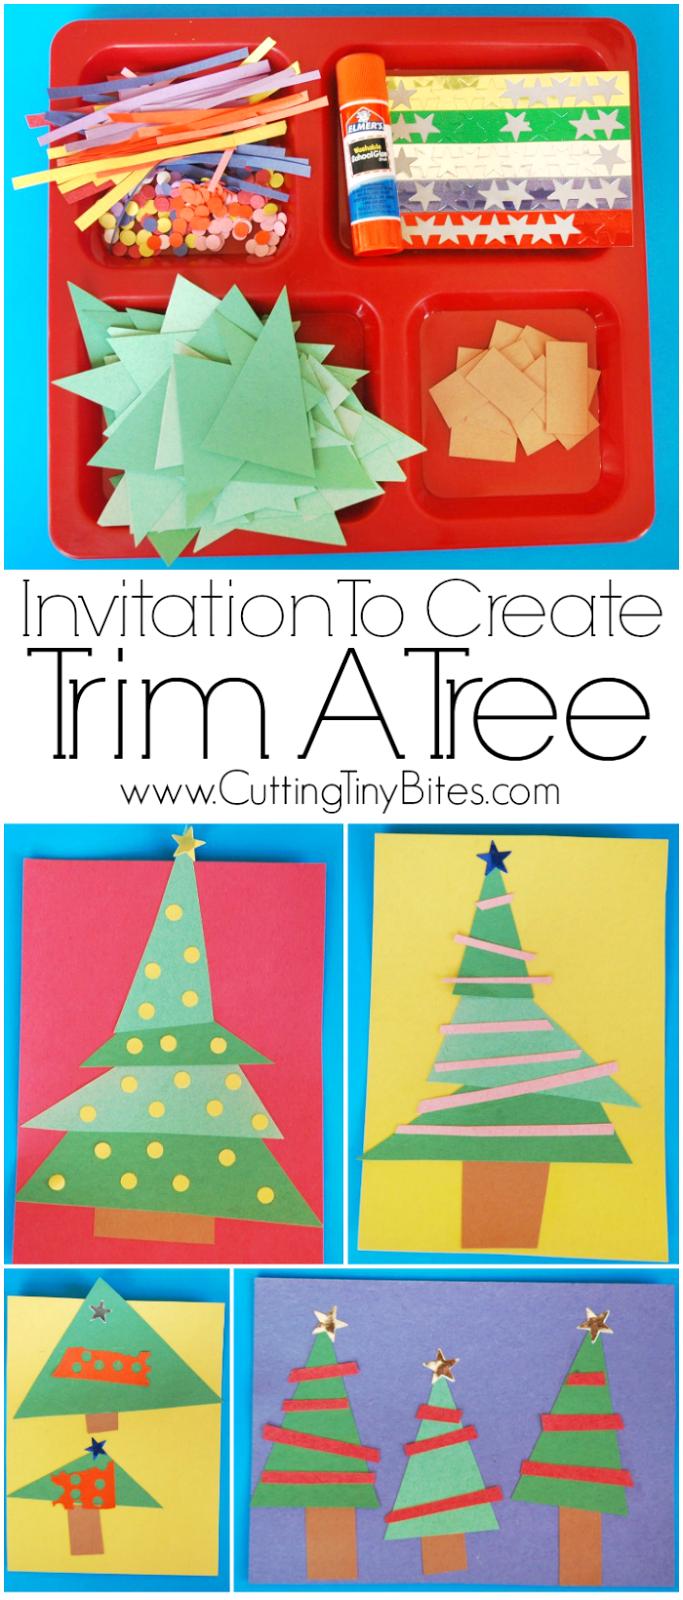 Quick Easy Christmas Craft Ideas Part - 38: Pinterest